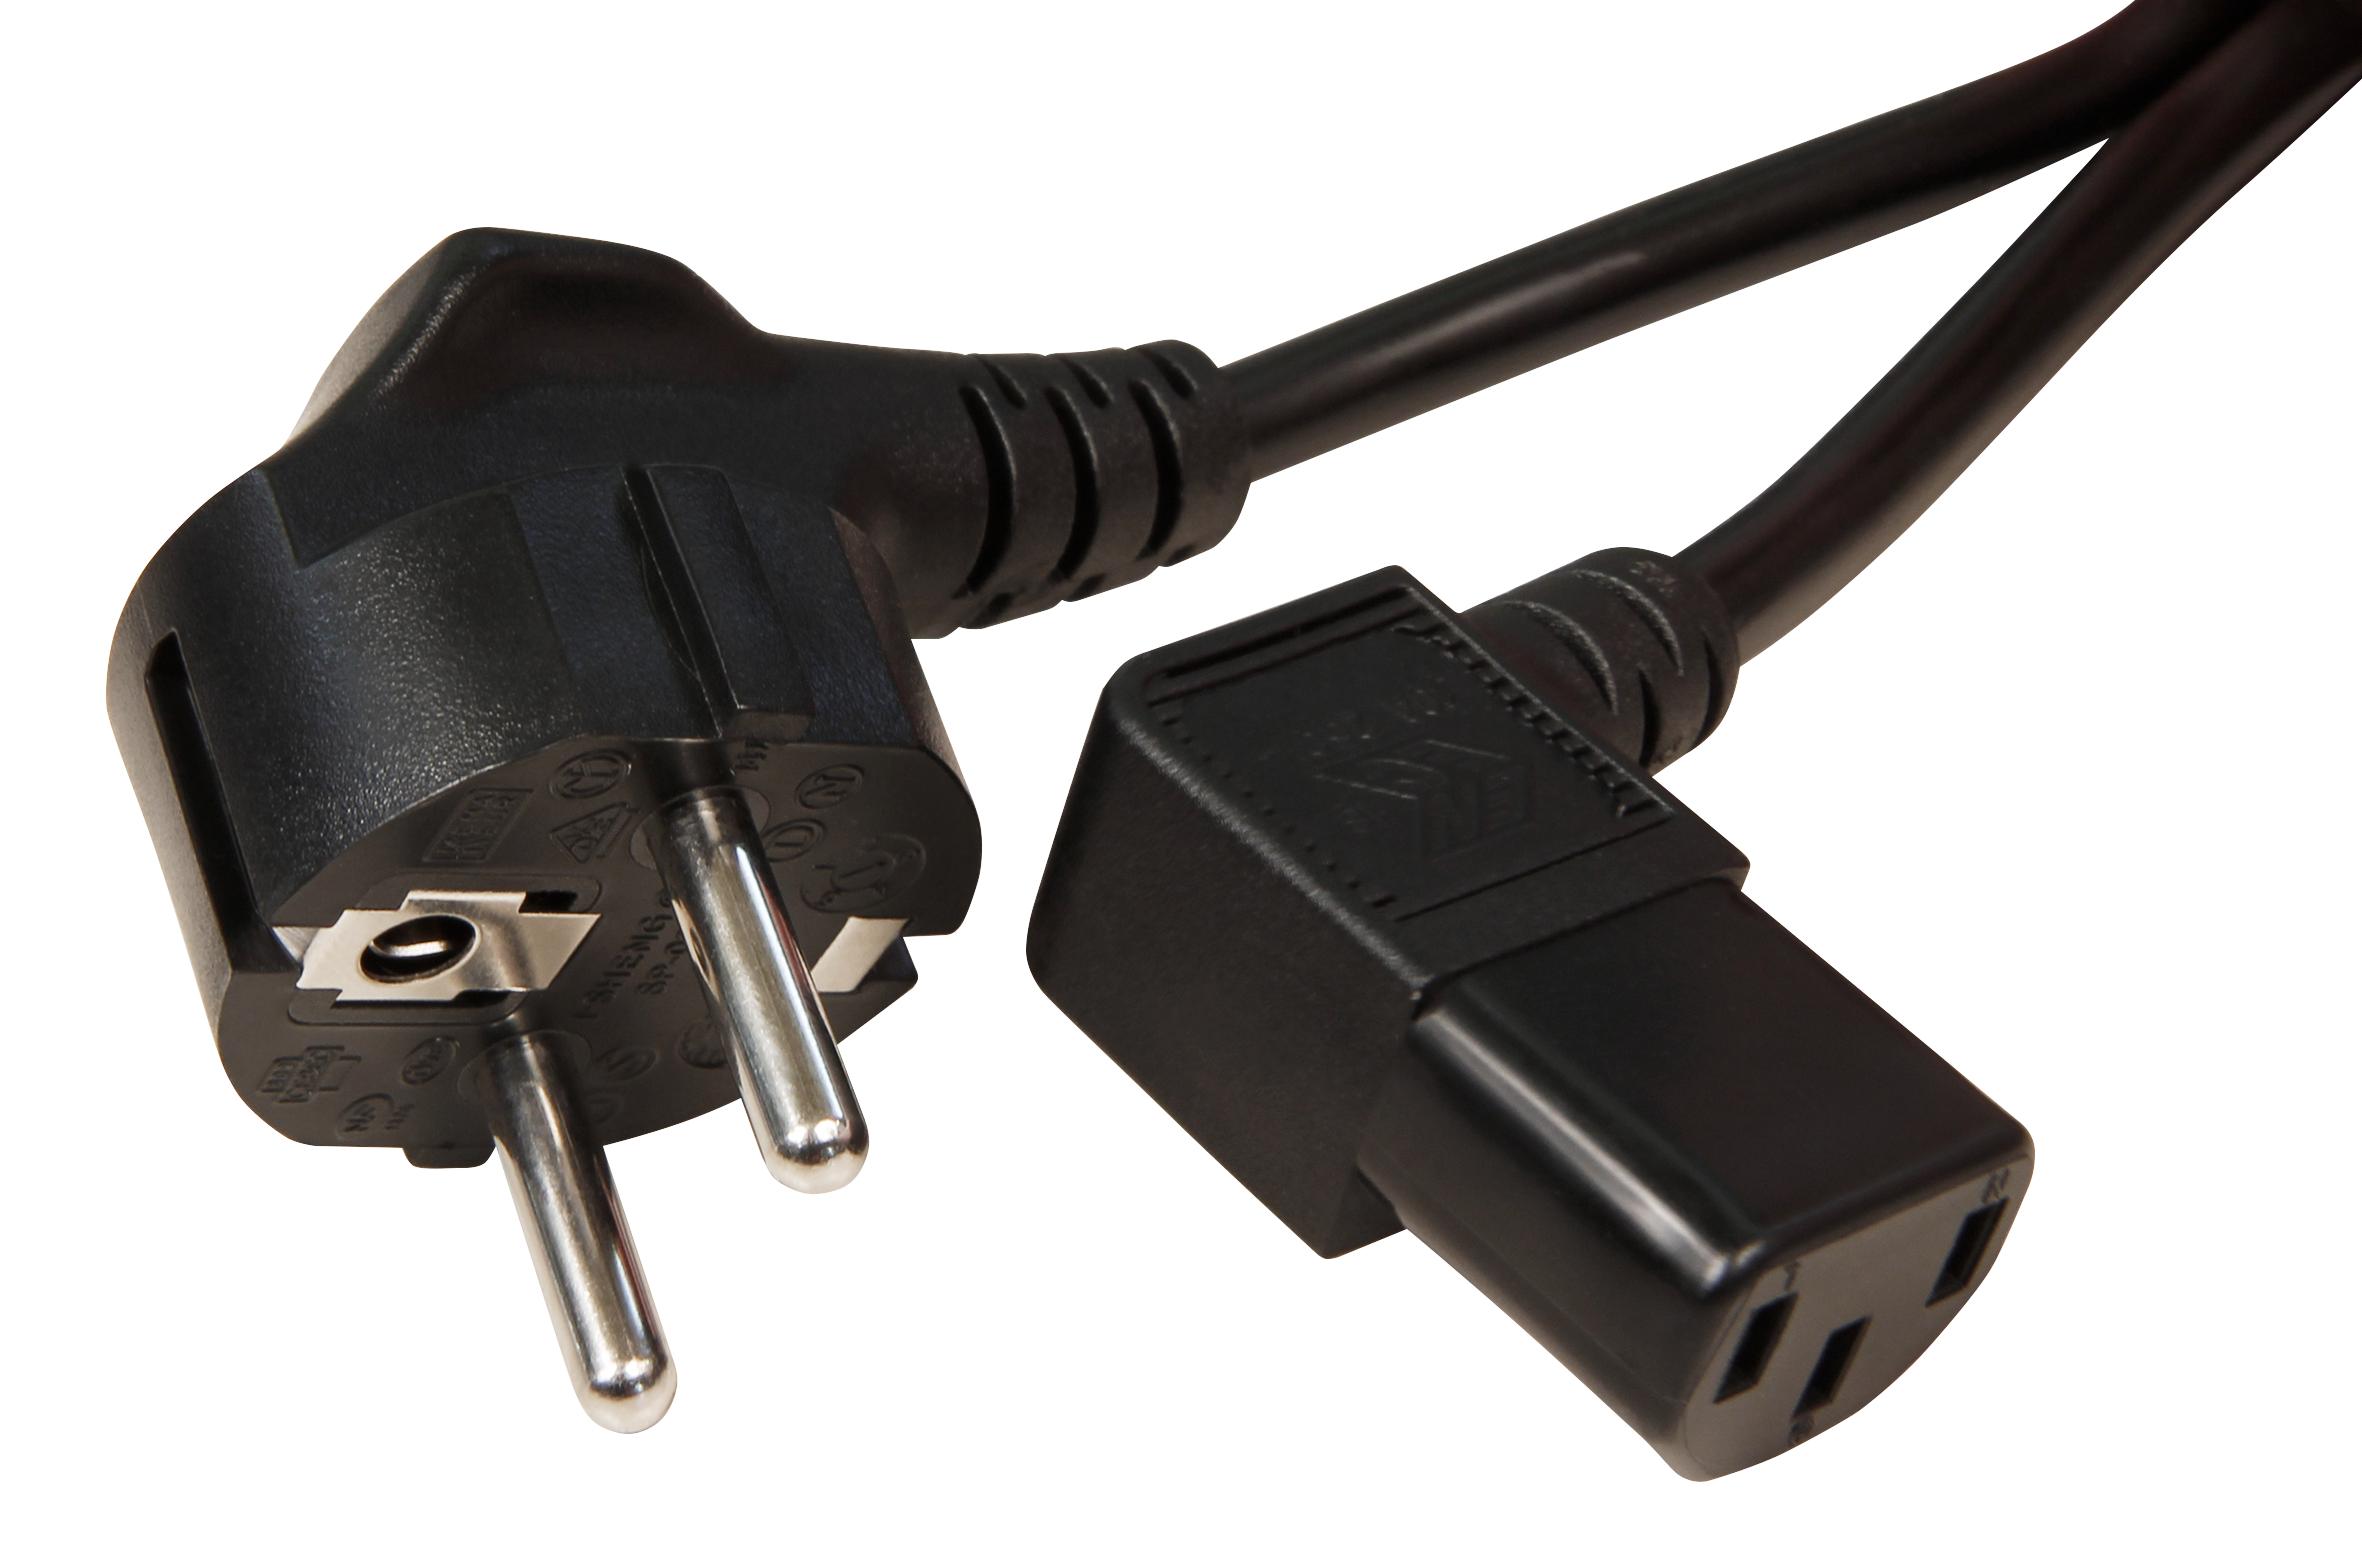 Kaltgeräte-Netzkabel Schutzk.-Winkelstecker Kaltgeräte-Kupplung, 2 m, 3x0,75 mm², schwarz